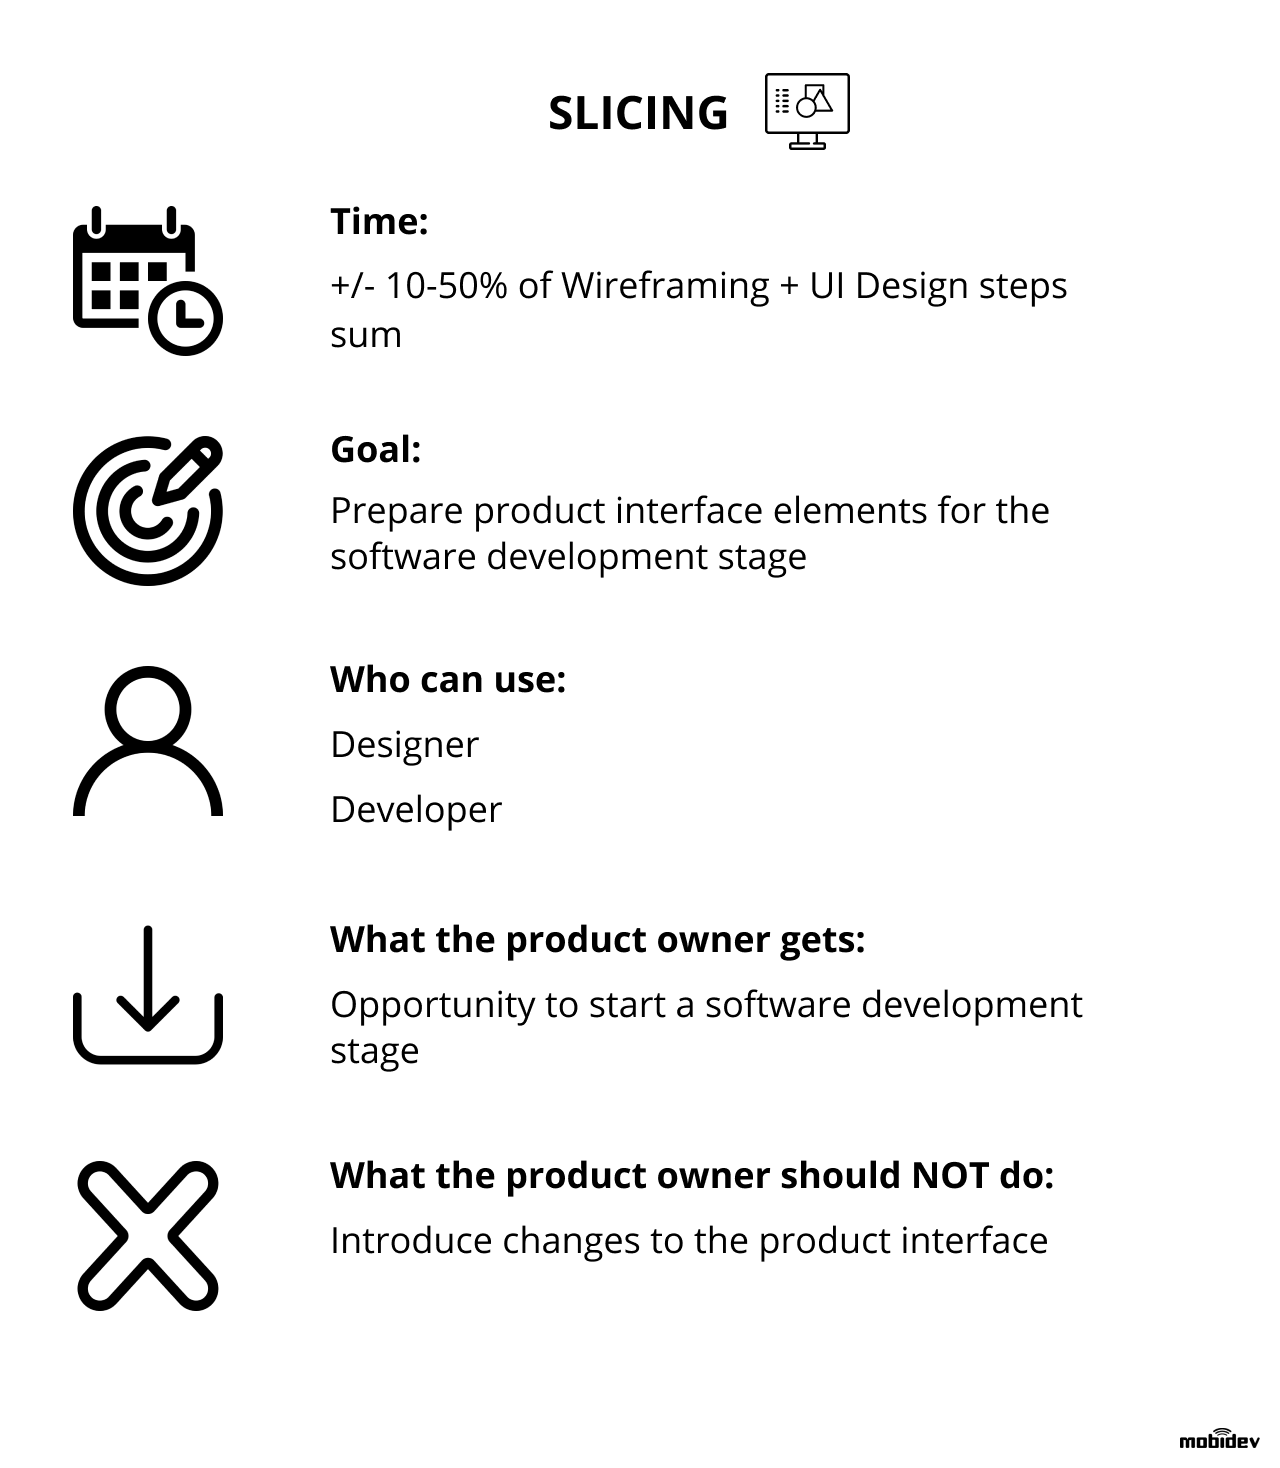 Deliverables at slicing stage of UI/UX design process